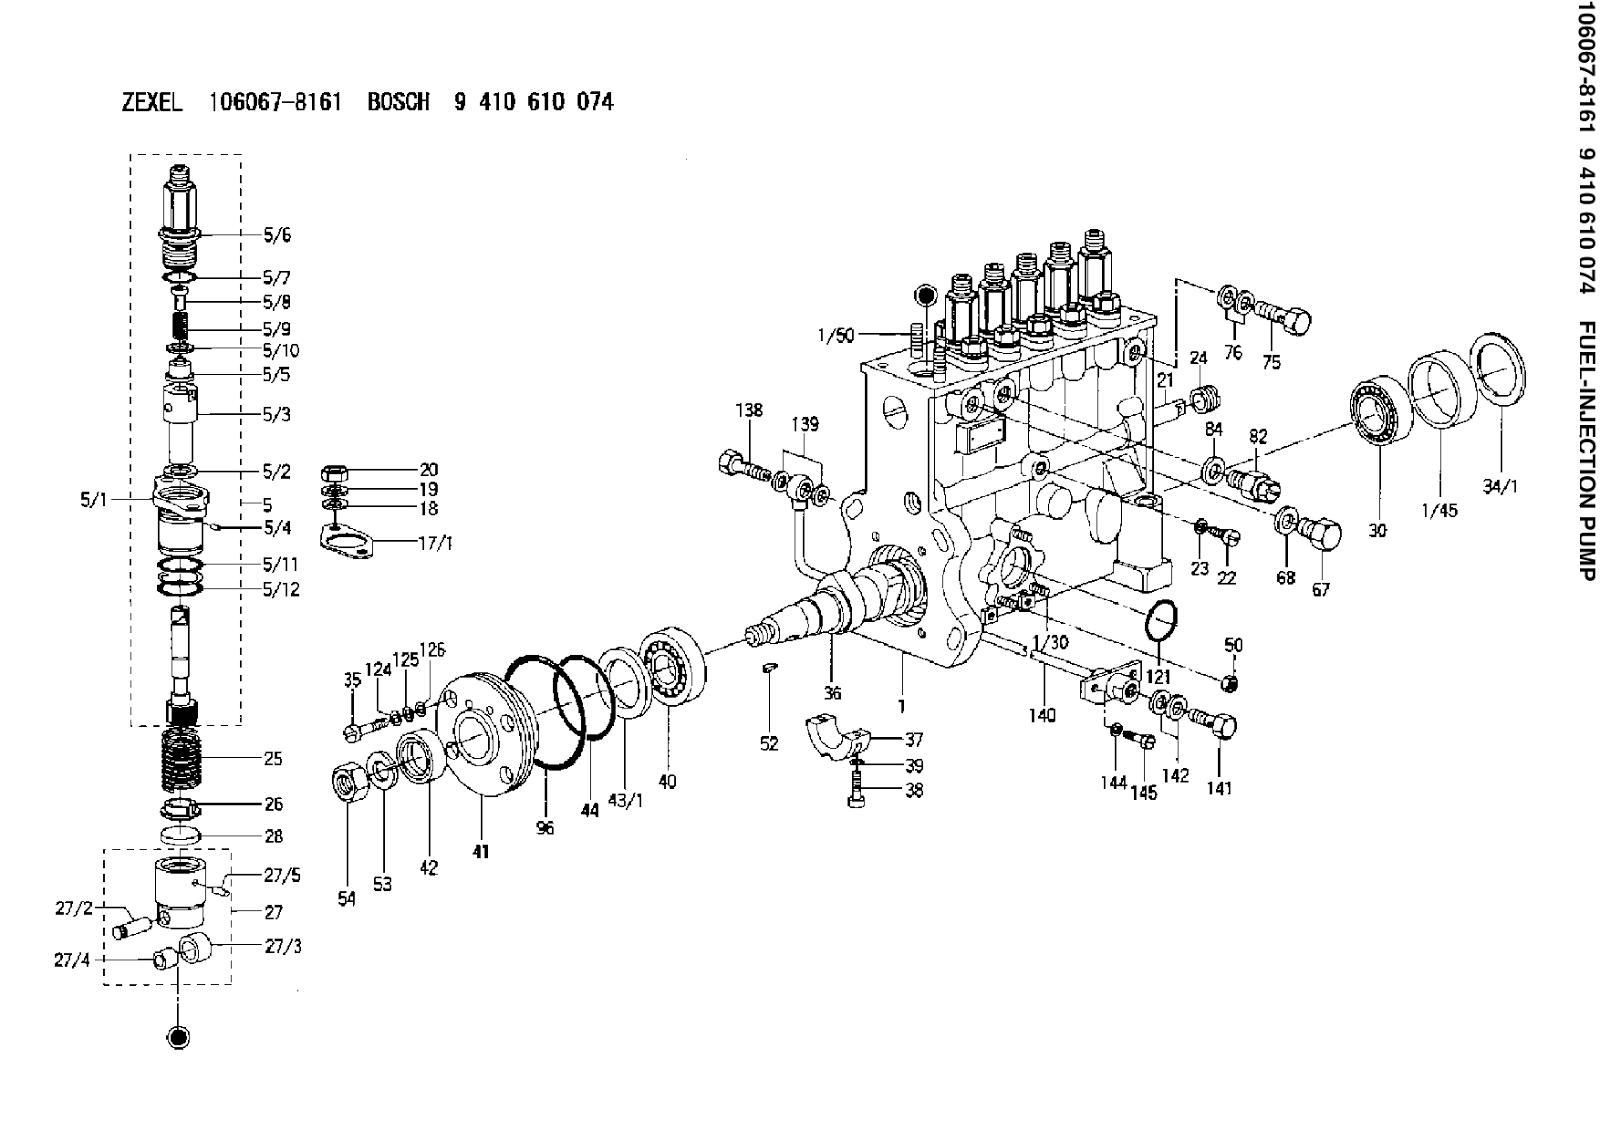 9410610074 106067 8161 injection pump zexel bosch  [ 1600 x 1131 Pixel ]